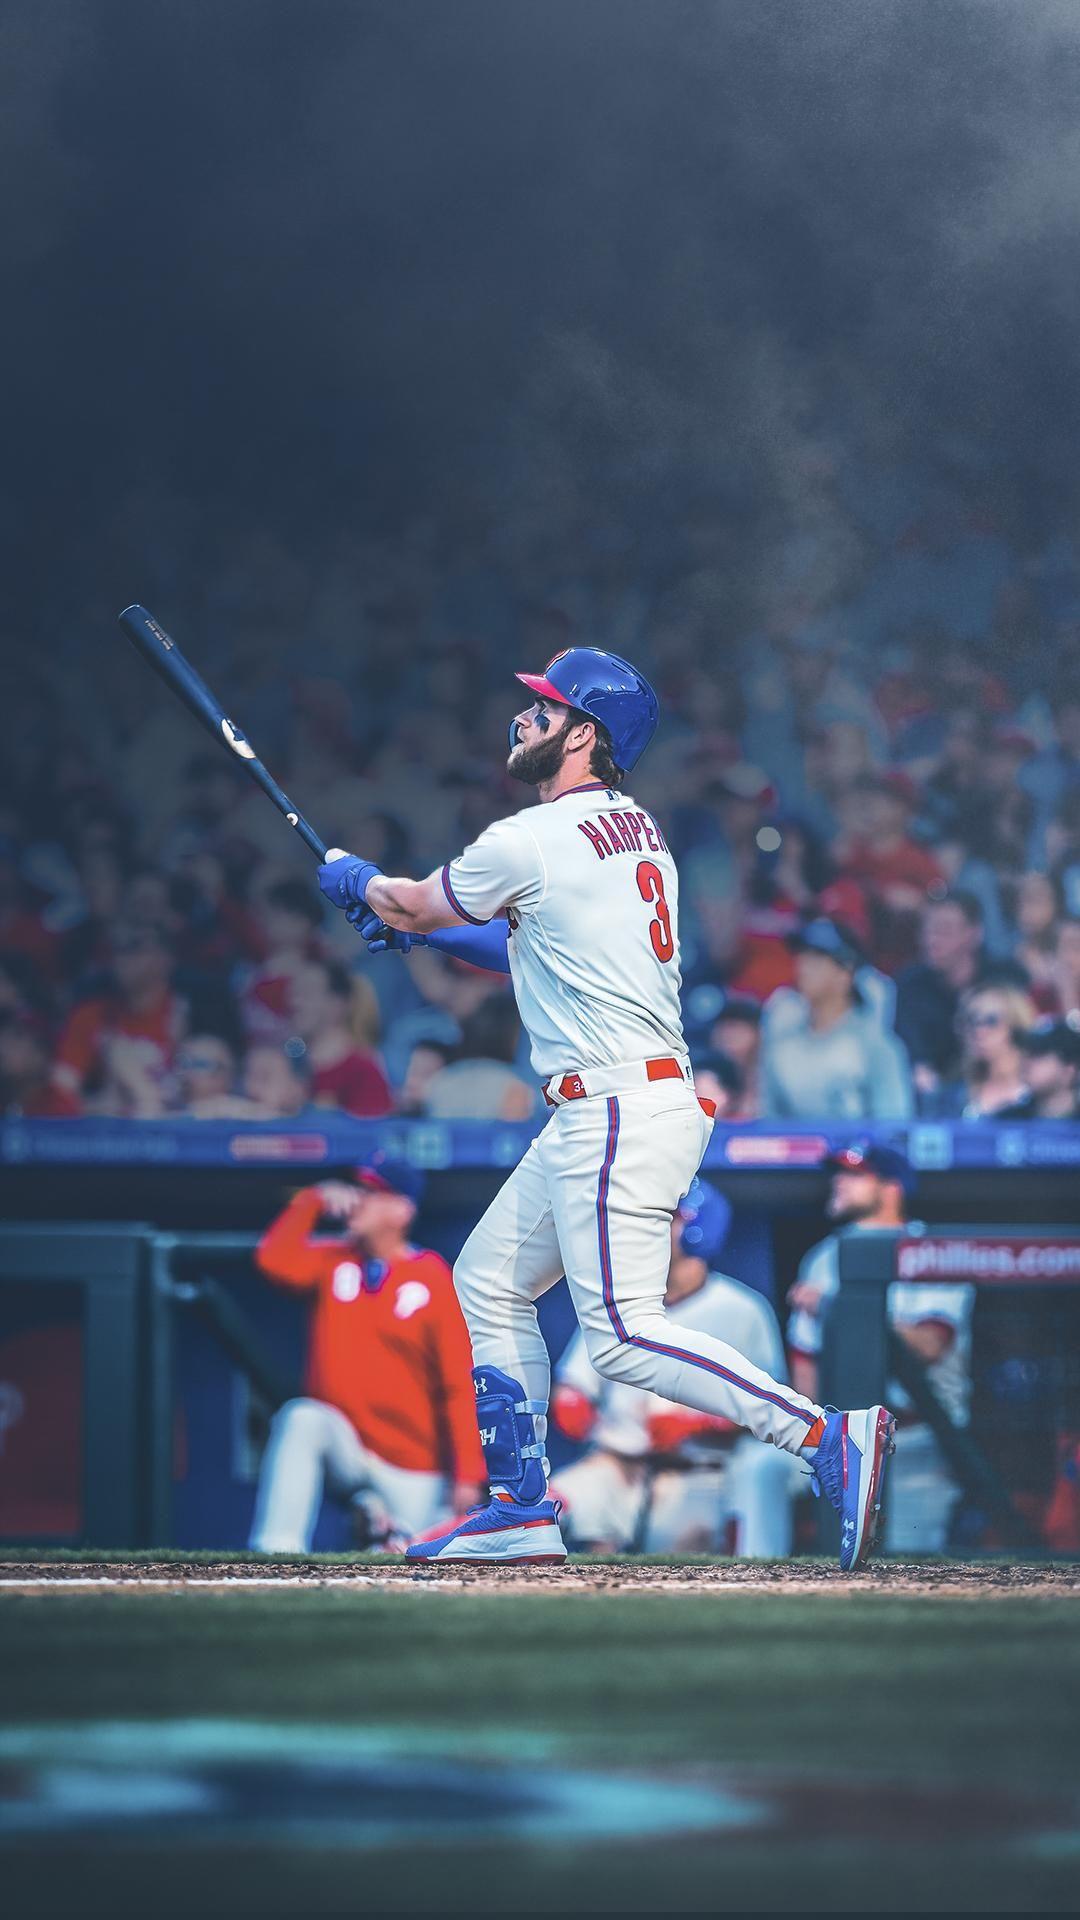 Mlb Baseball Wallpaper Android Download In 2020 Baseball Wallpaper Baseball Game Outfits Mlb Wallpaper